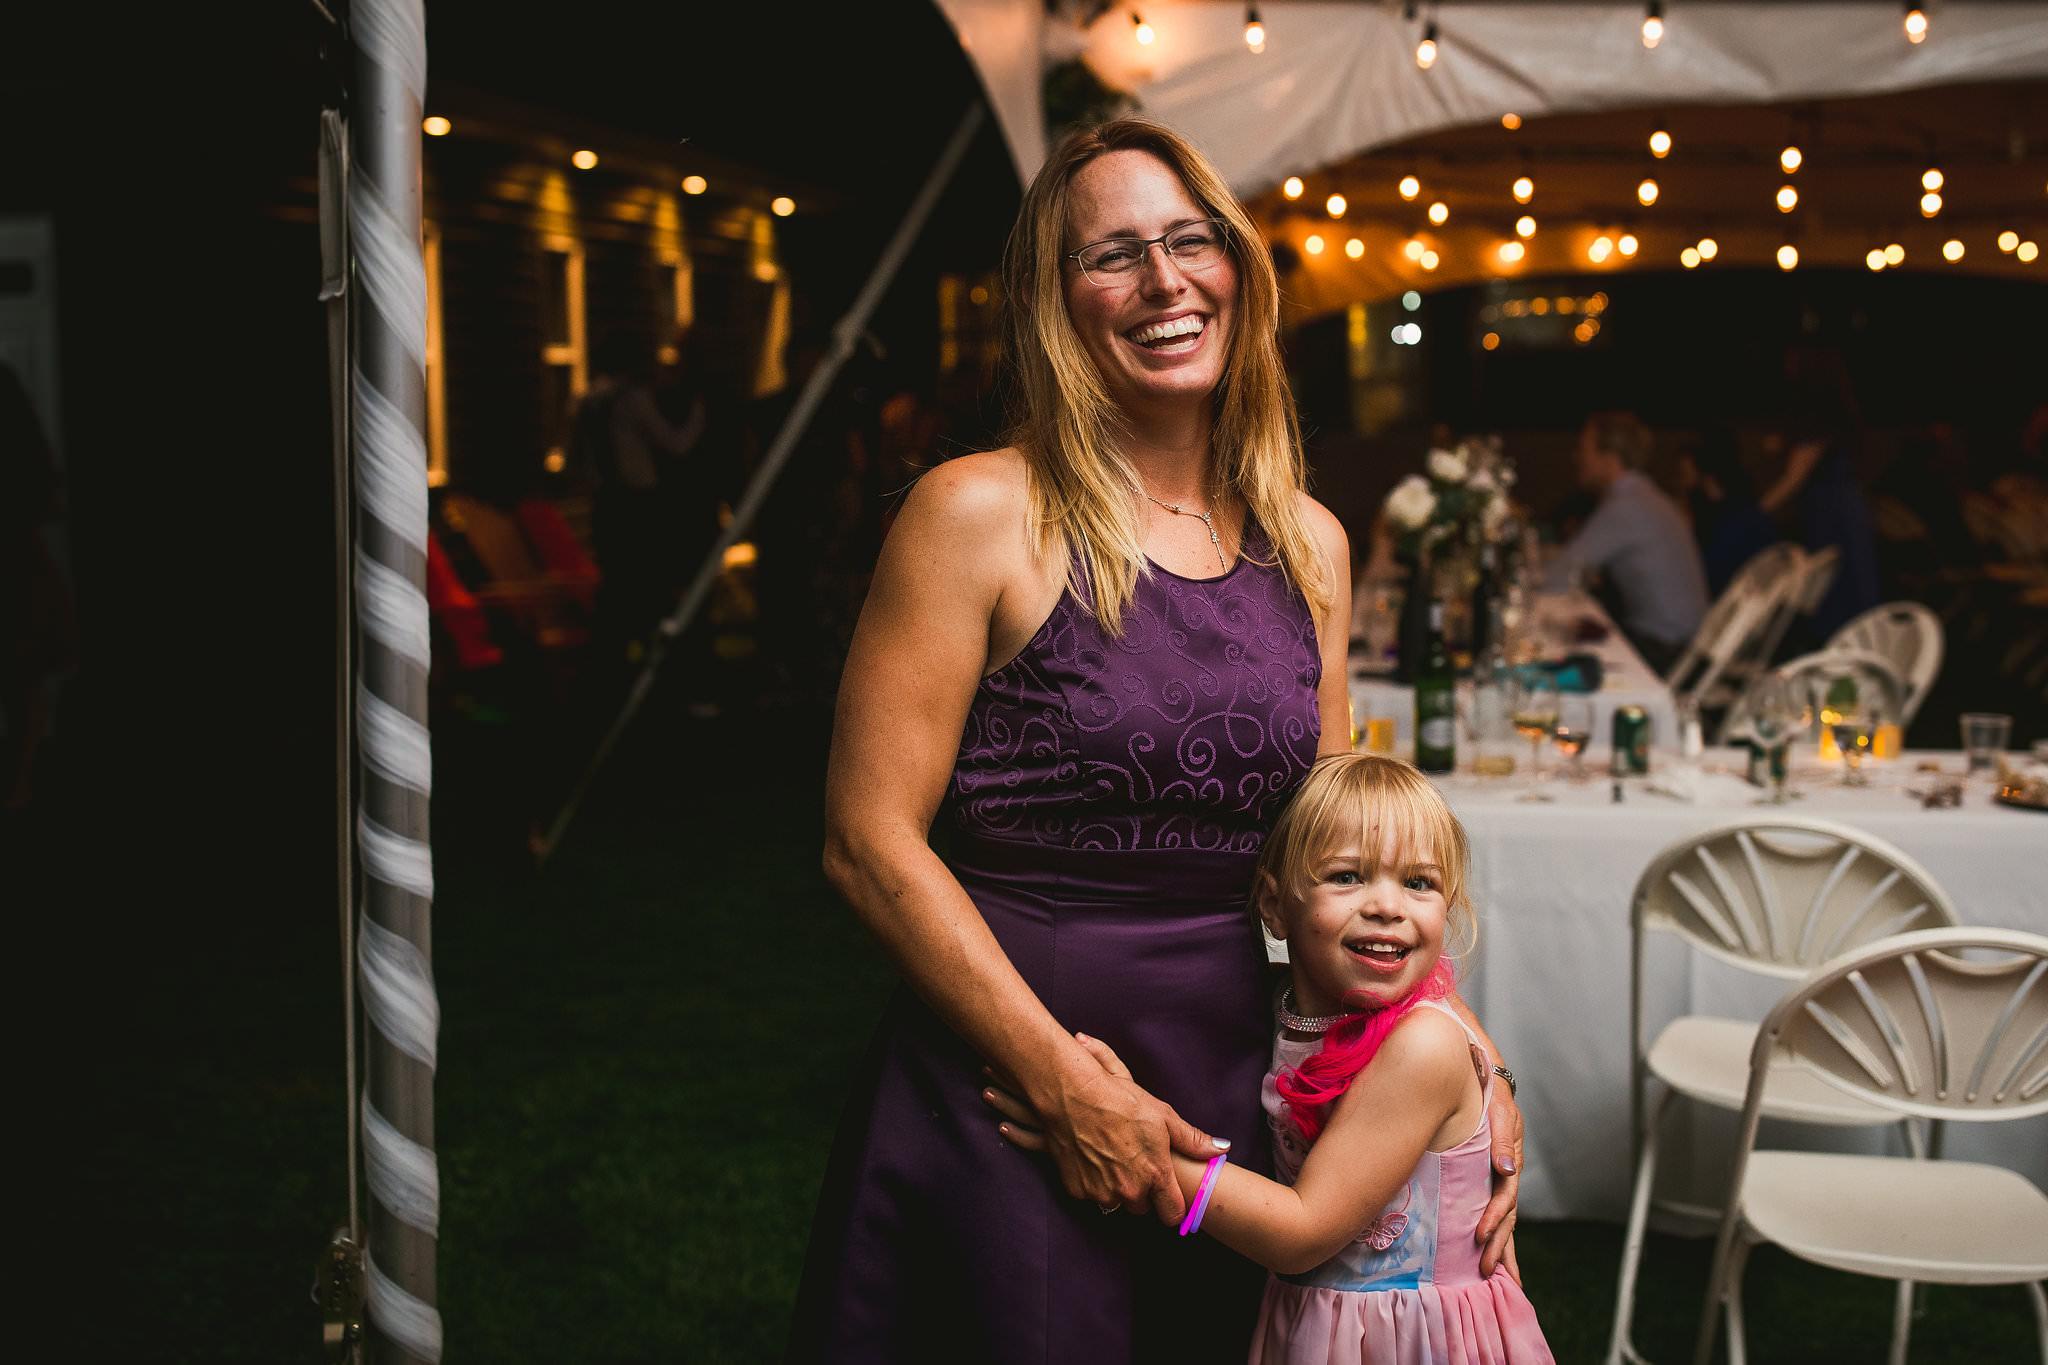 Kristen Adam Kindred Loft Whitby Wedding Photos 616 - Durham Wedding Photographer: Kindred Loft Wedding Photos